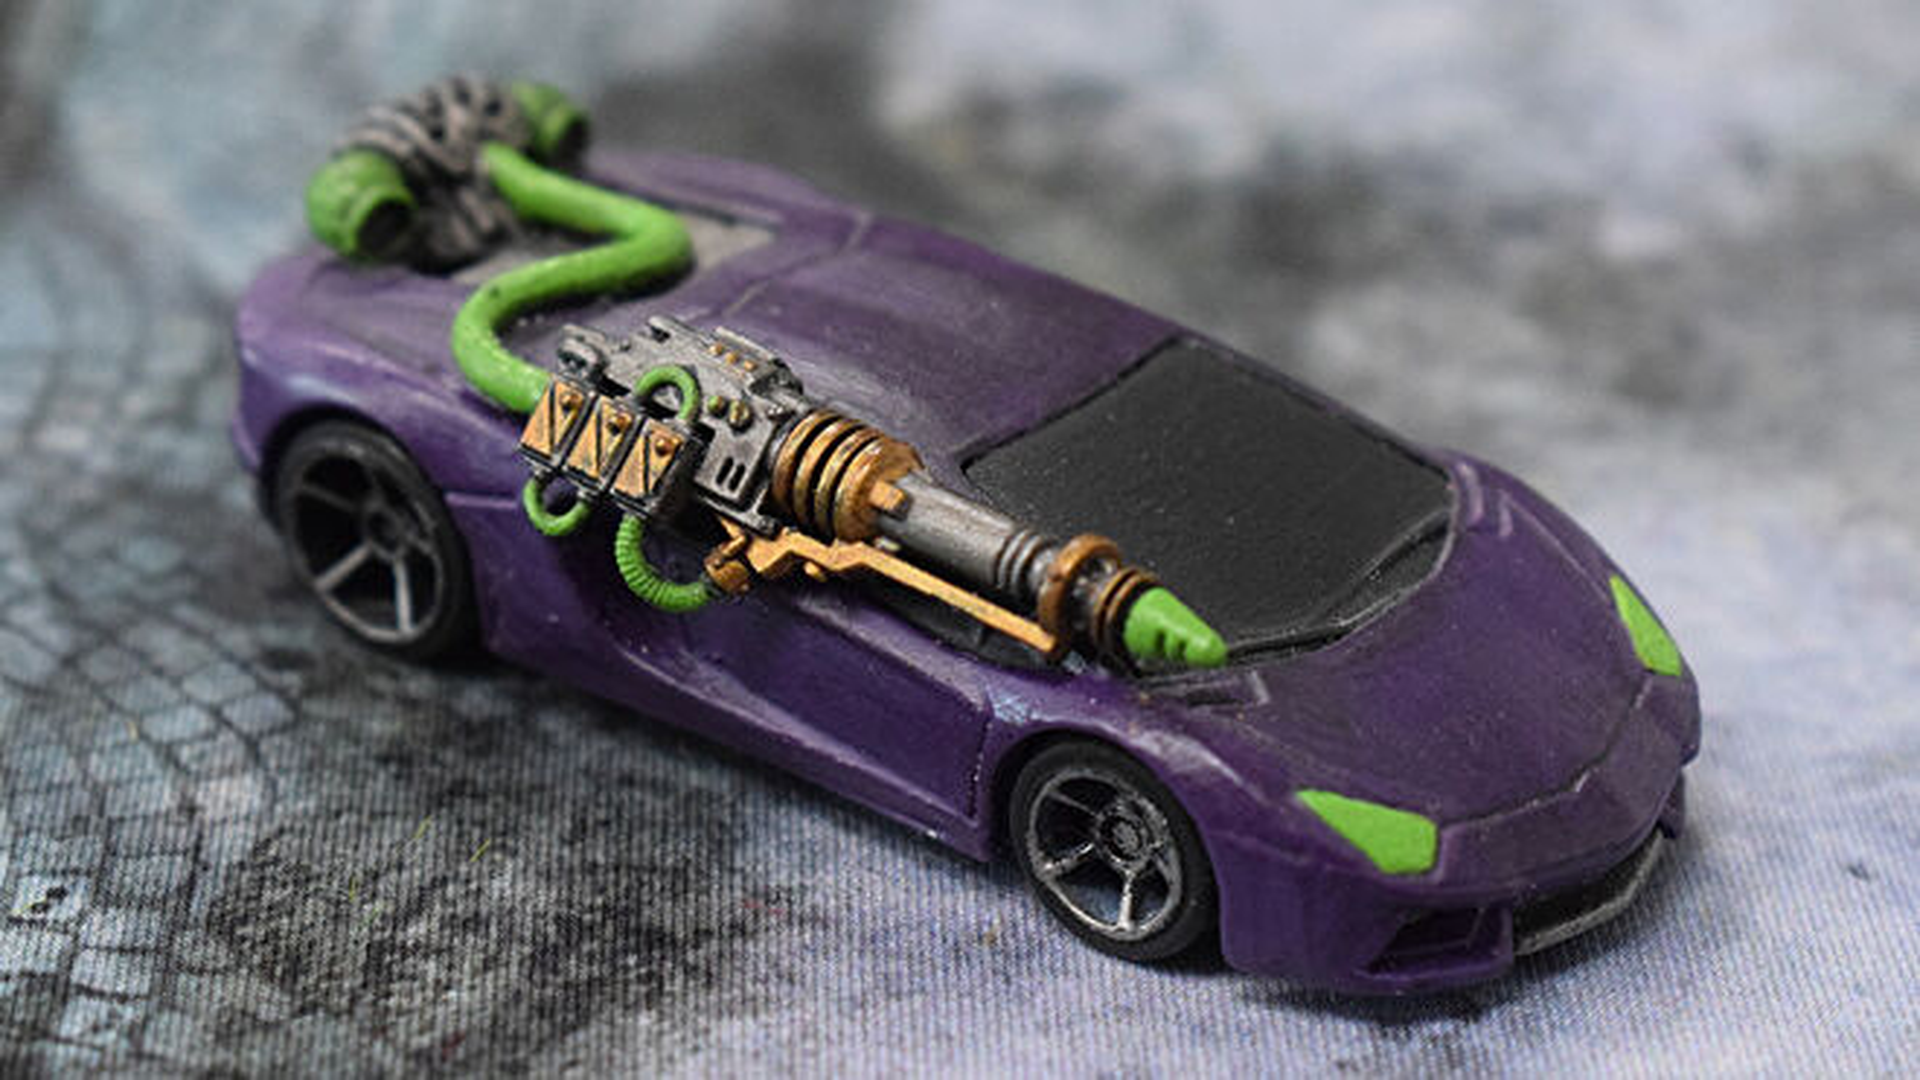 gaslands-refuelled-miniatures-game-car.jpg